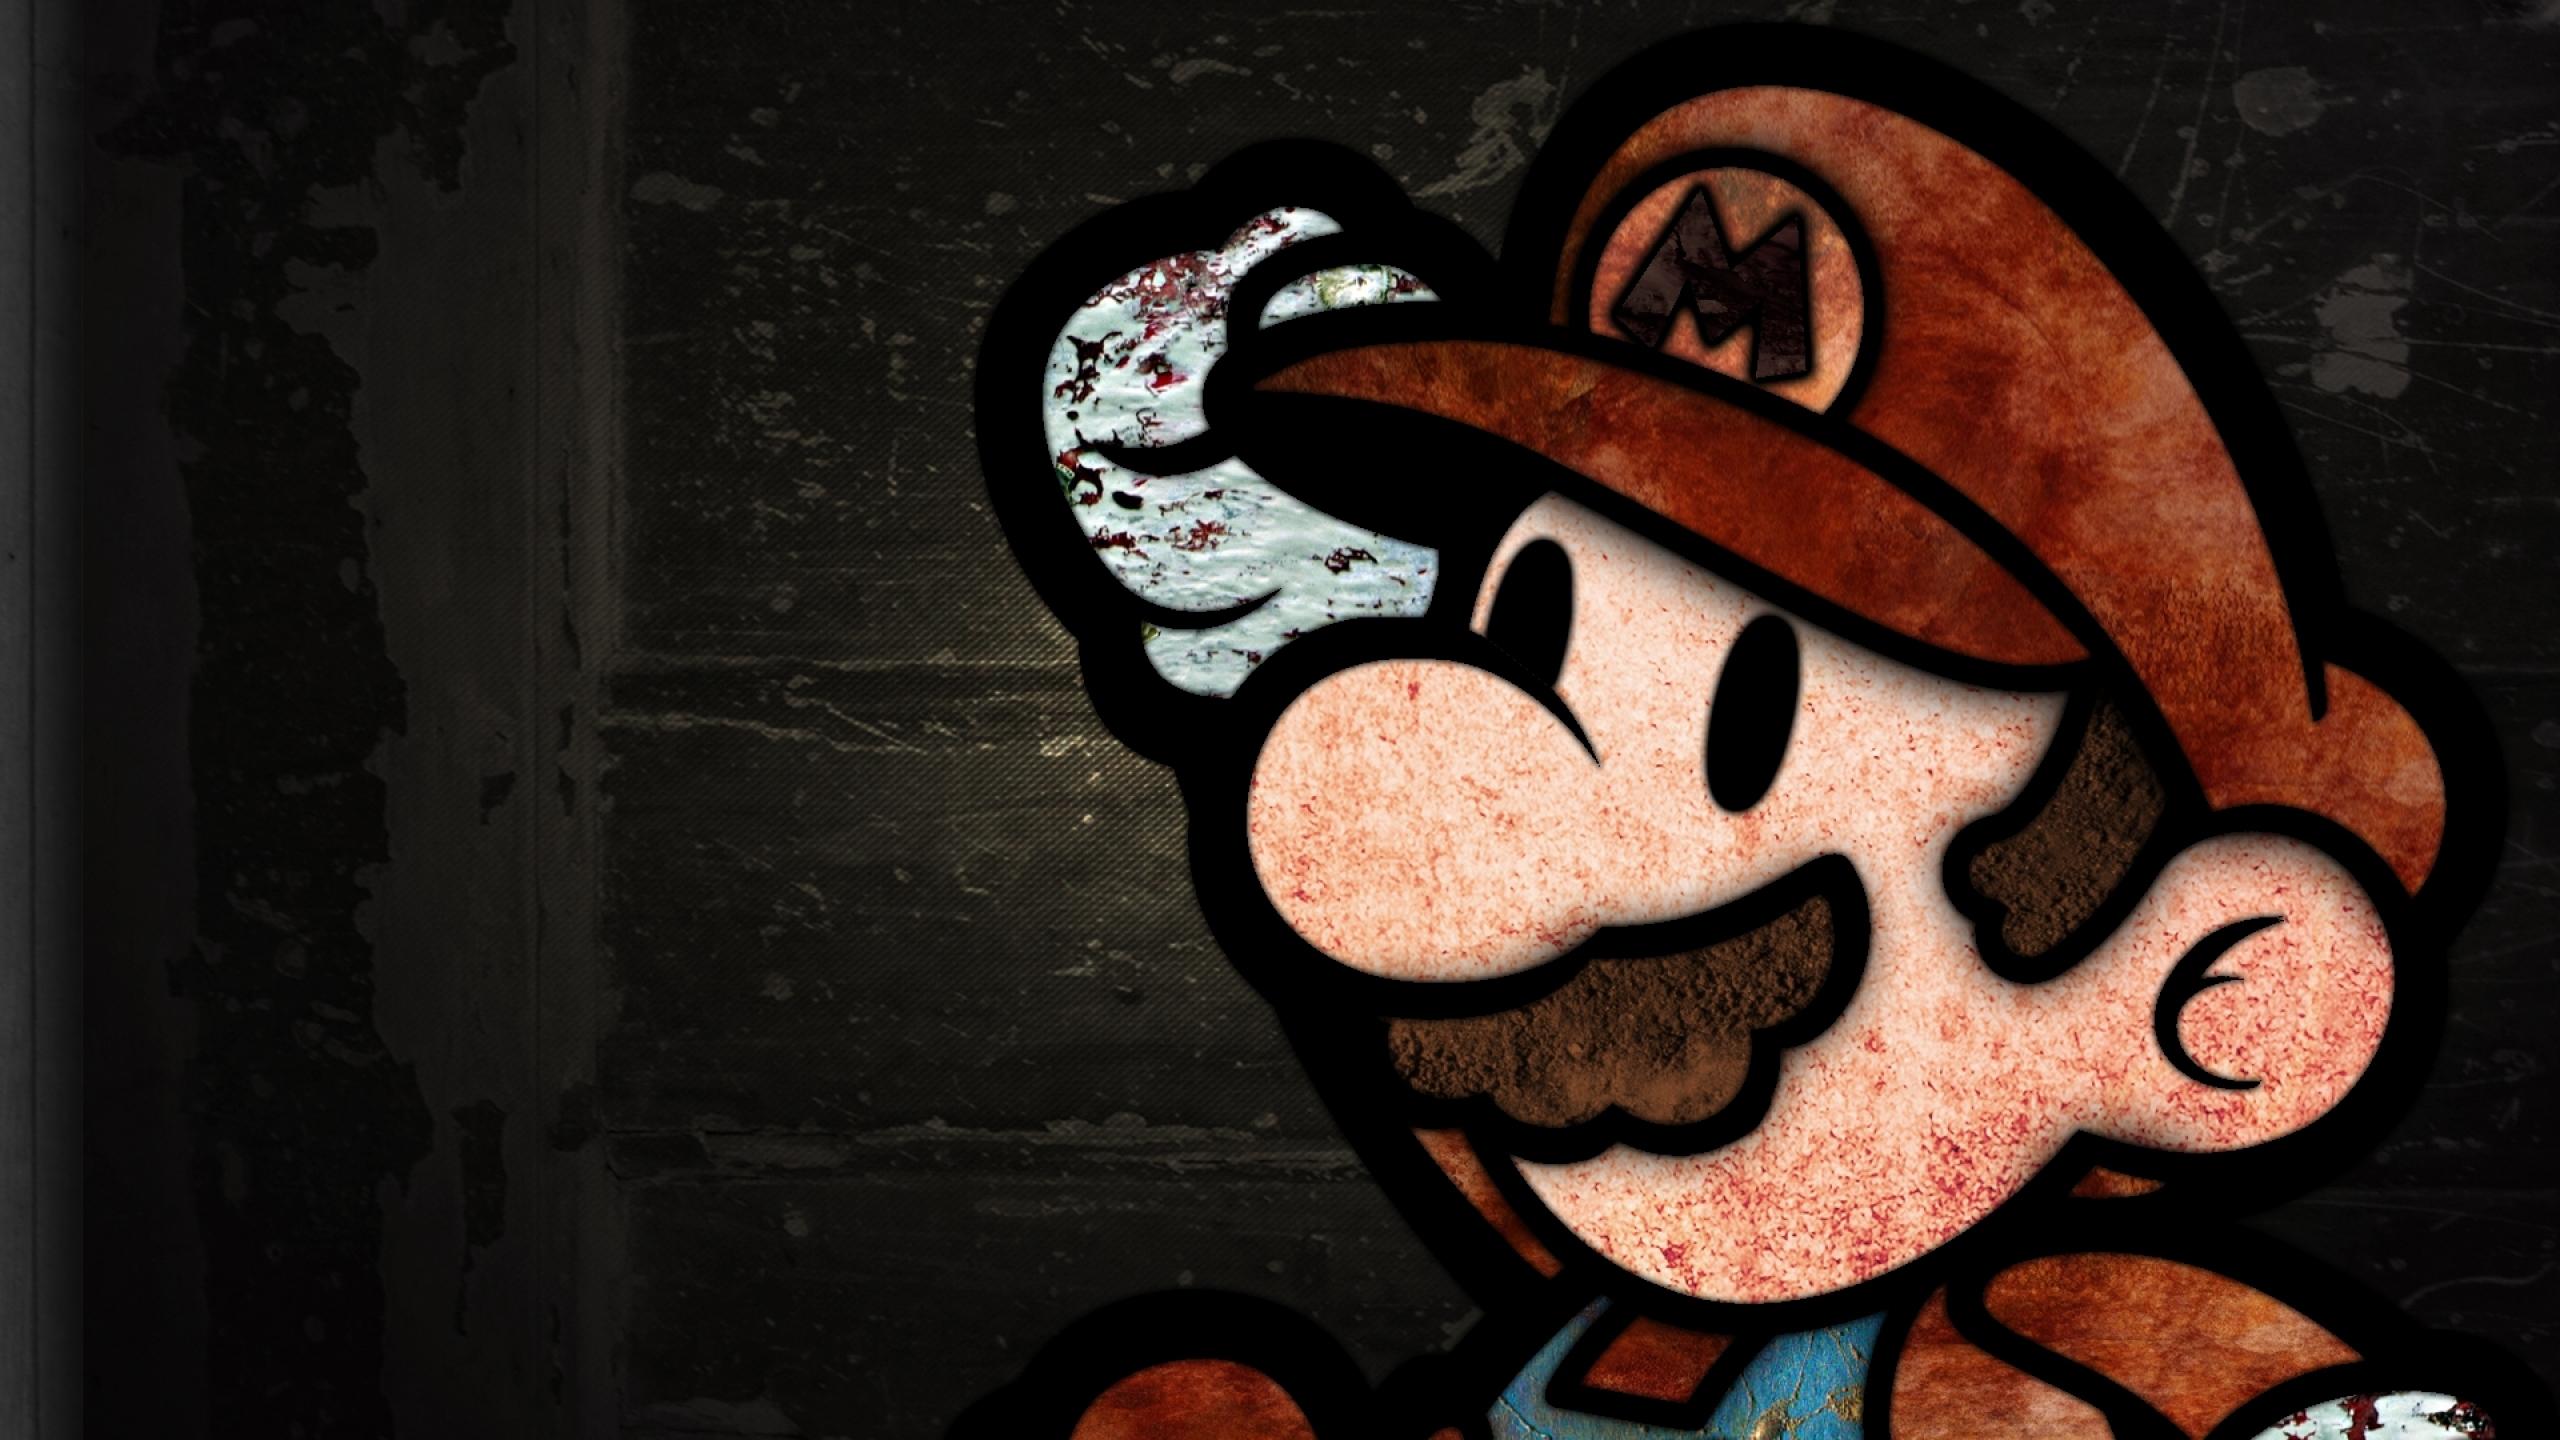 2560x1440 Gaming Wallpaper Gamer wallpaper xwallpapers 2560x1440